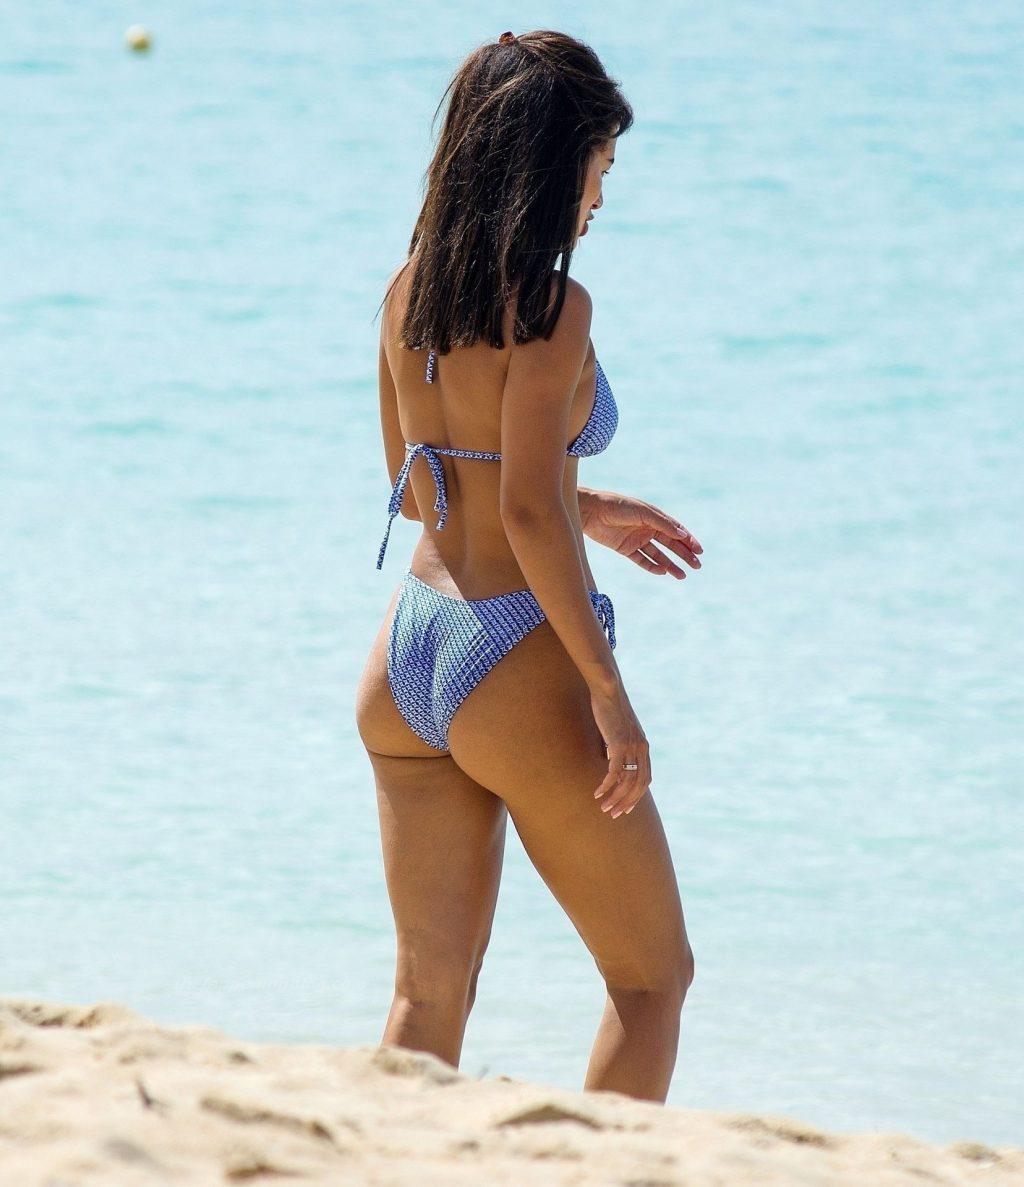 Montana Brown Looks Sensational in a Blue Bikini (58 Photos)